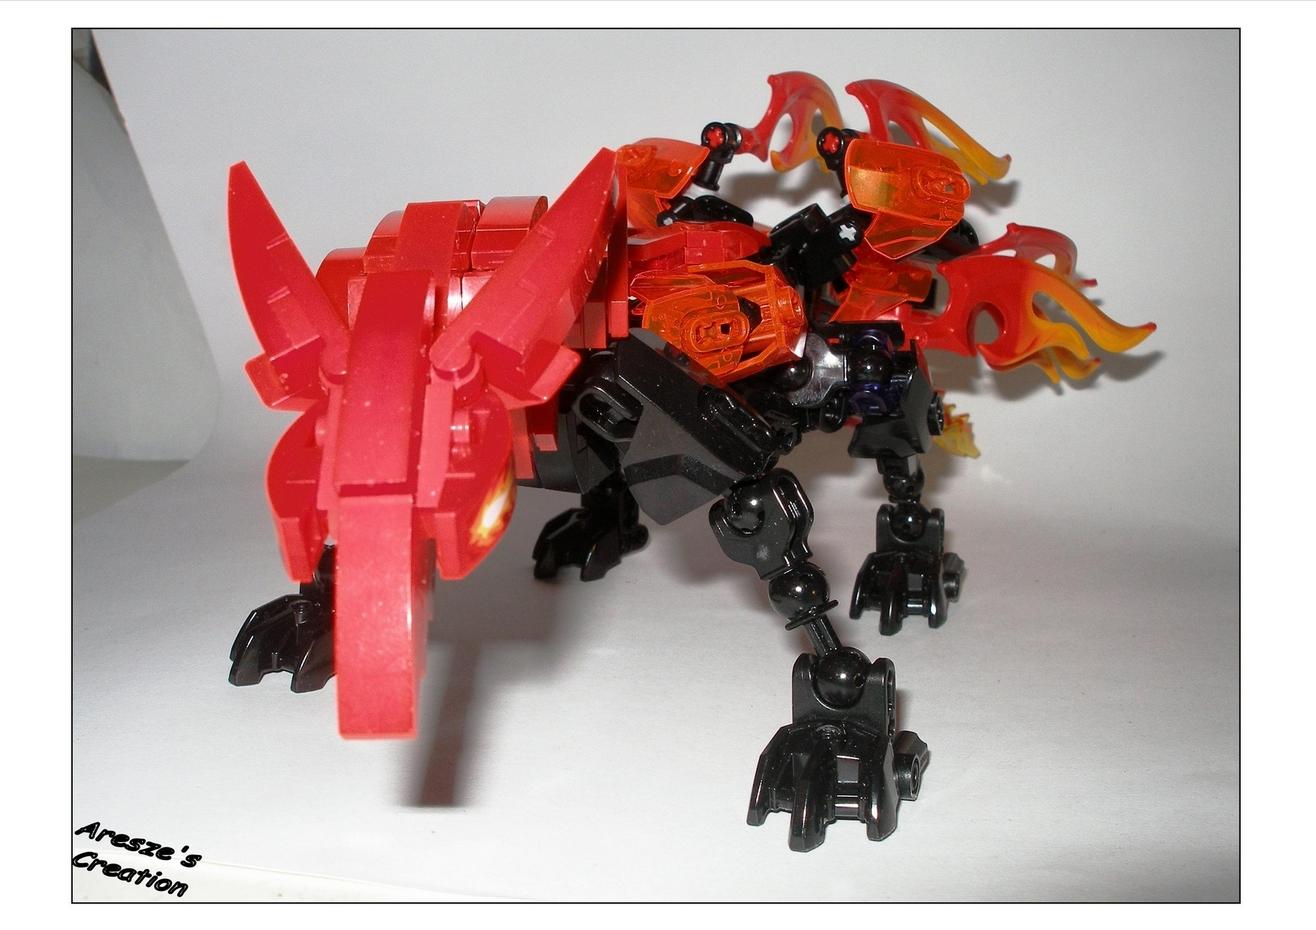 aresze moc - Nine-tailed Fox 009